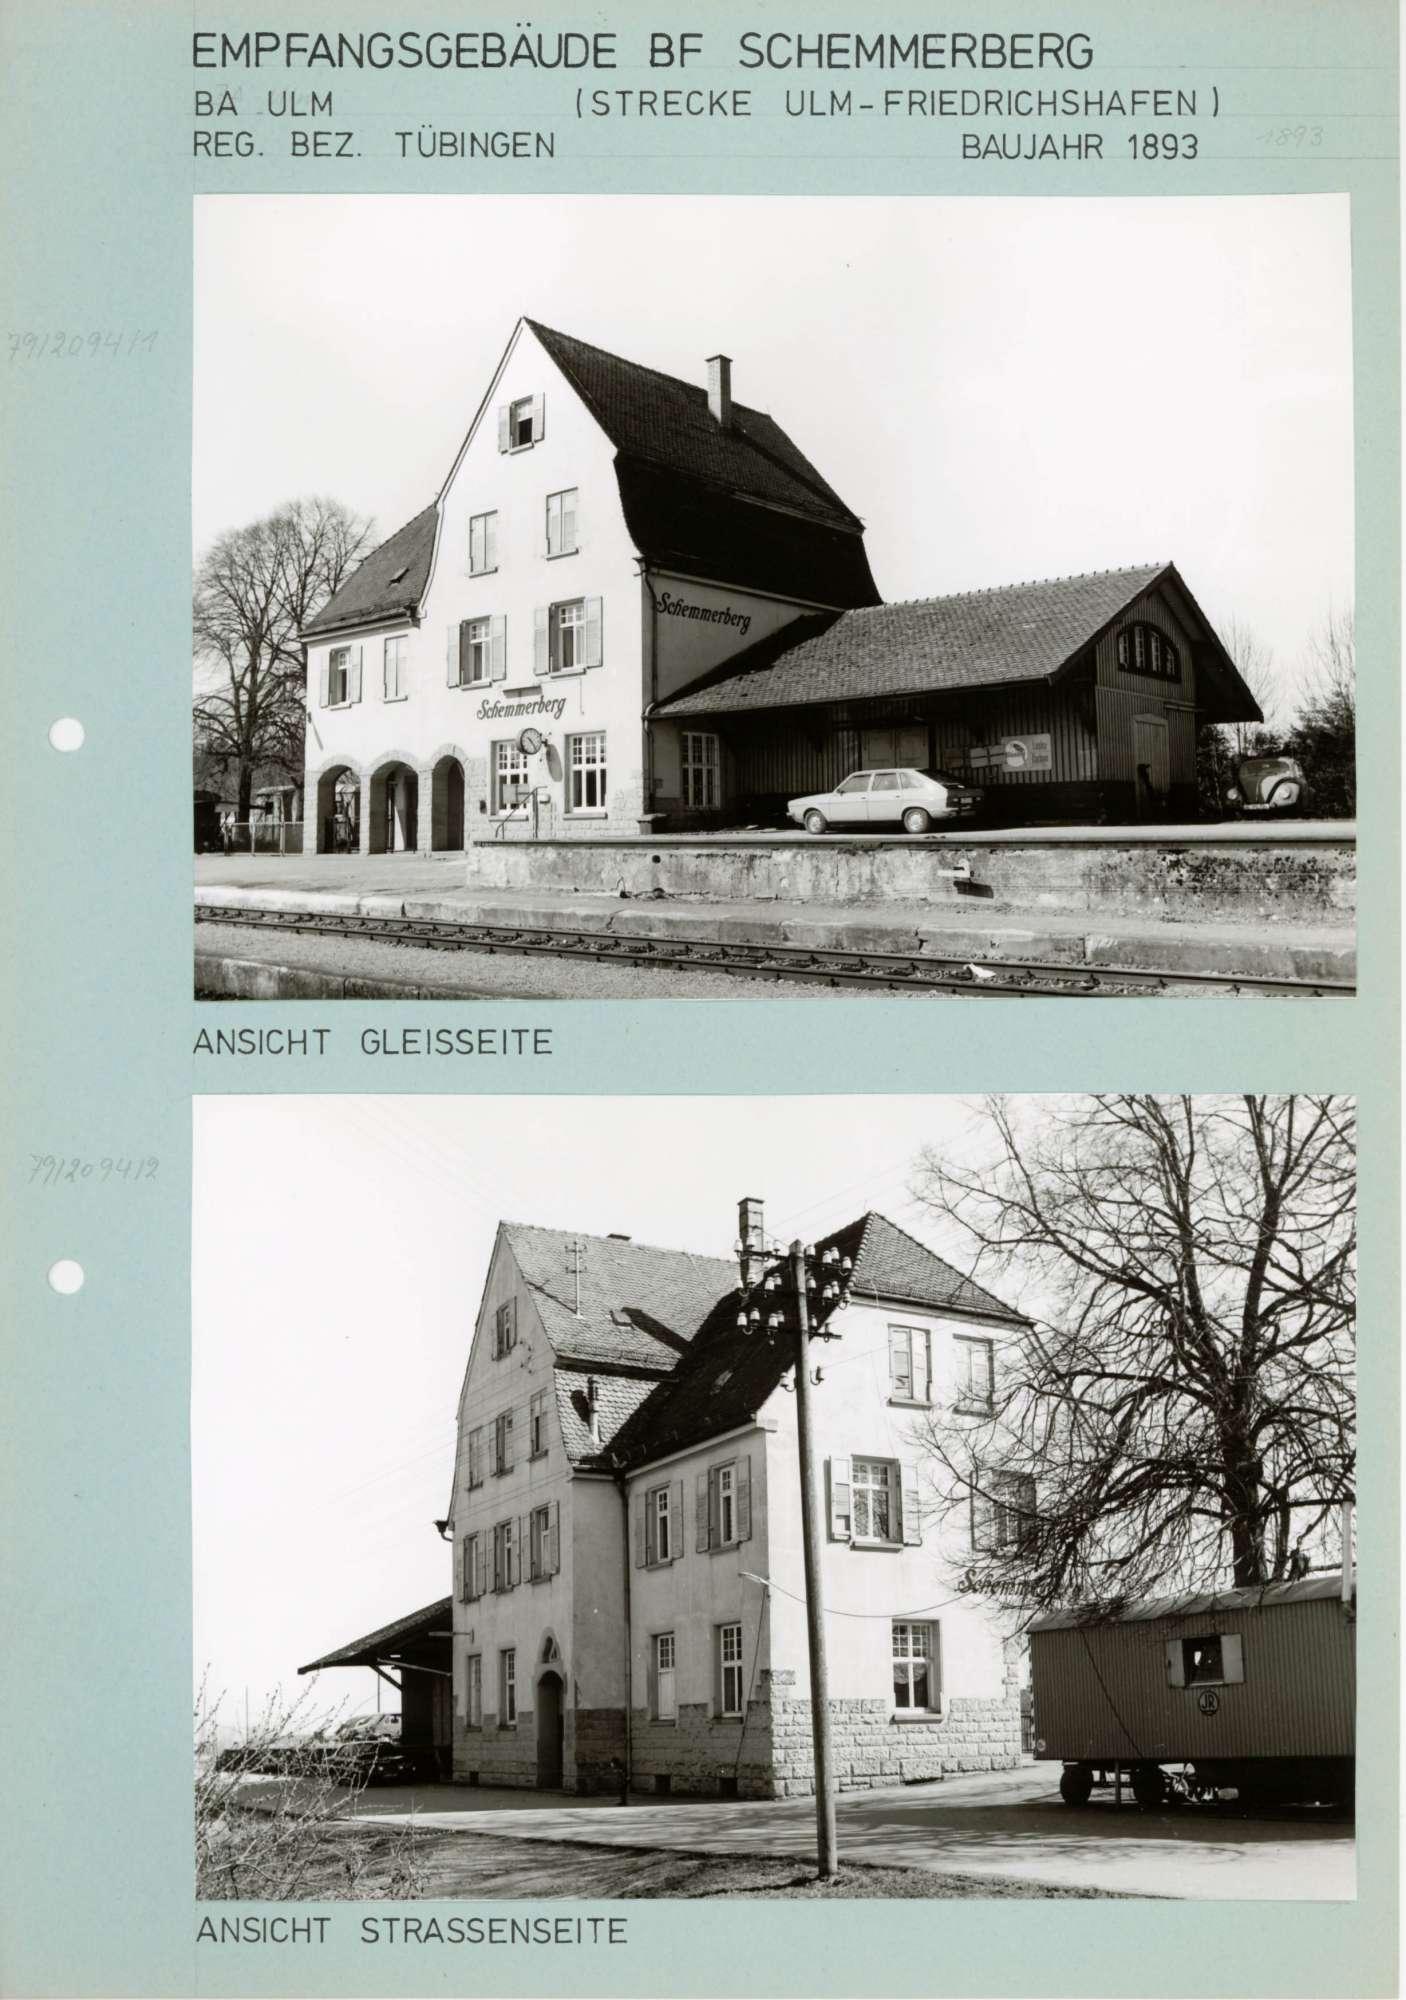 Schemmerberg: 6 Fotos, Bild 3